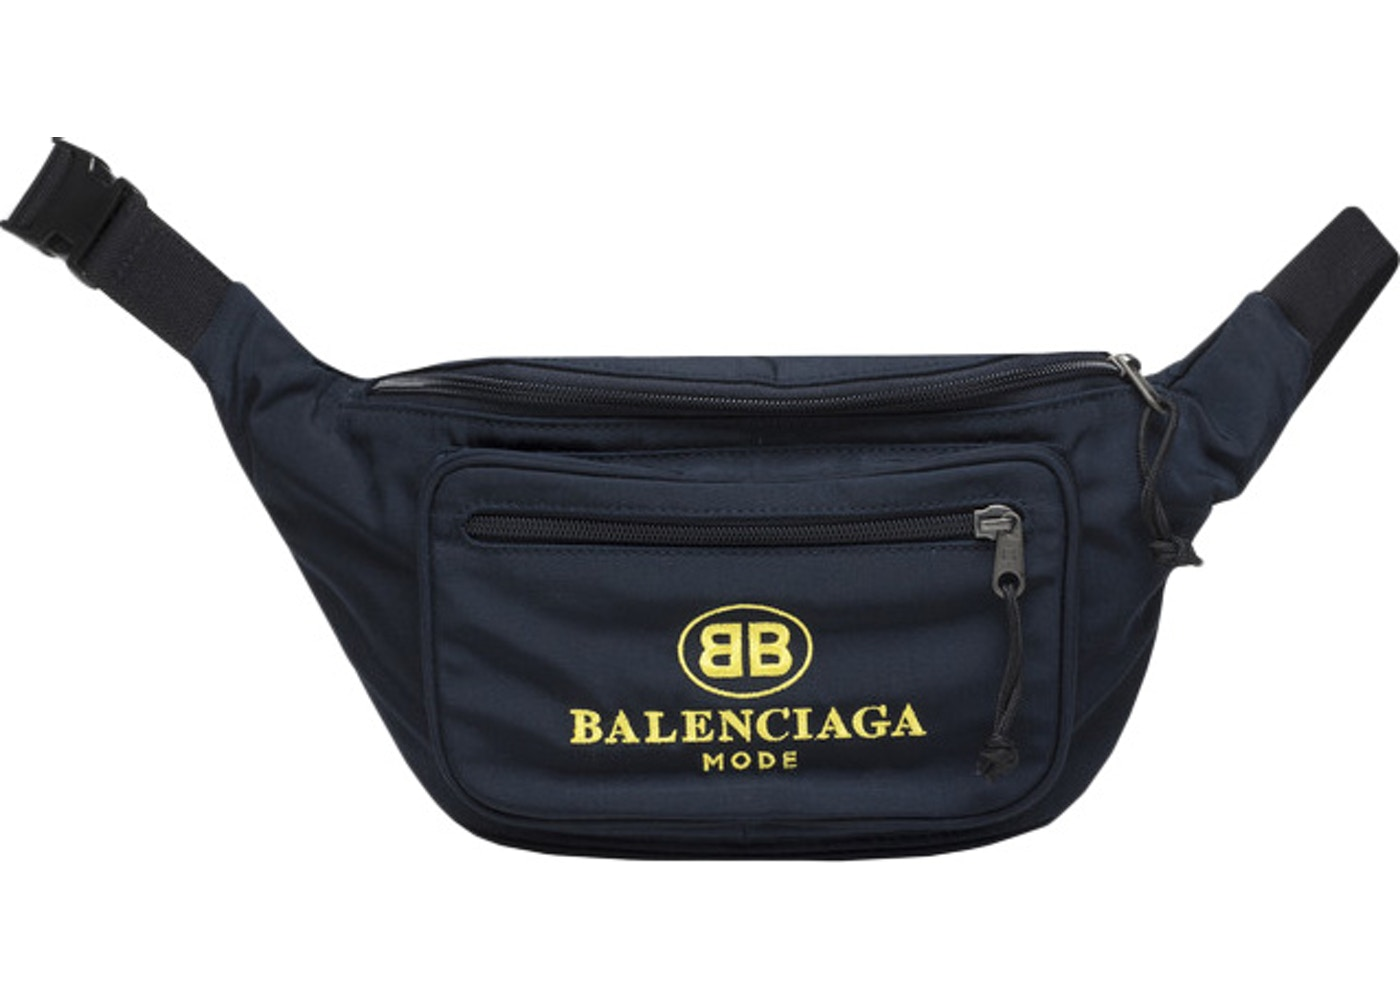 620c3420810a Balenciaga Explorer Belt Bag BB Mode Navy Yellow. BB Mode Navy Yellow